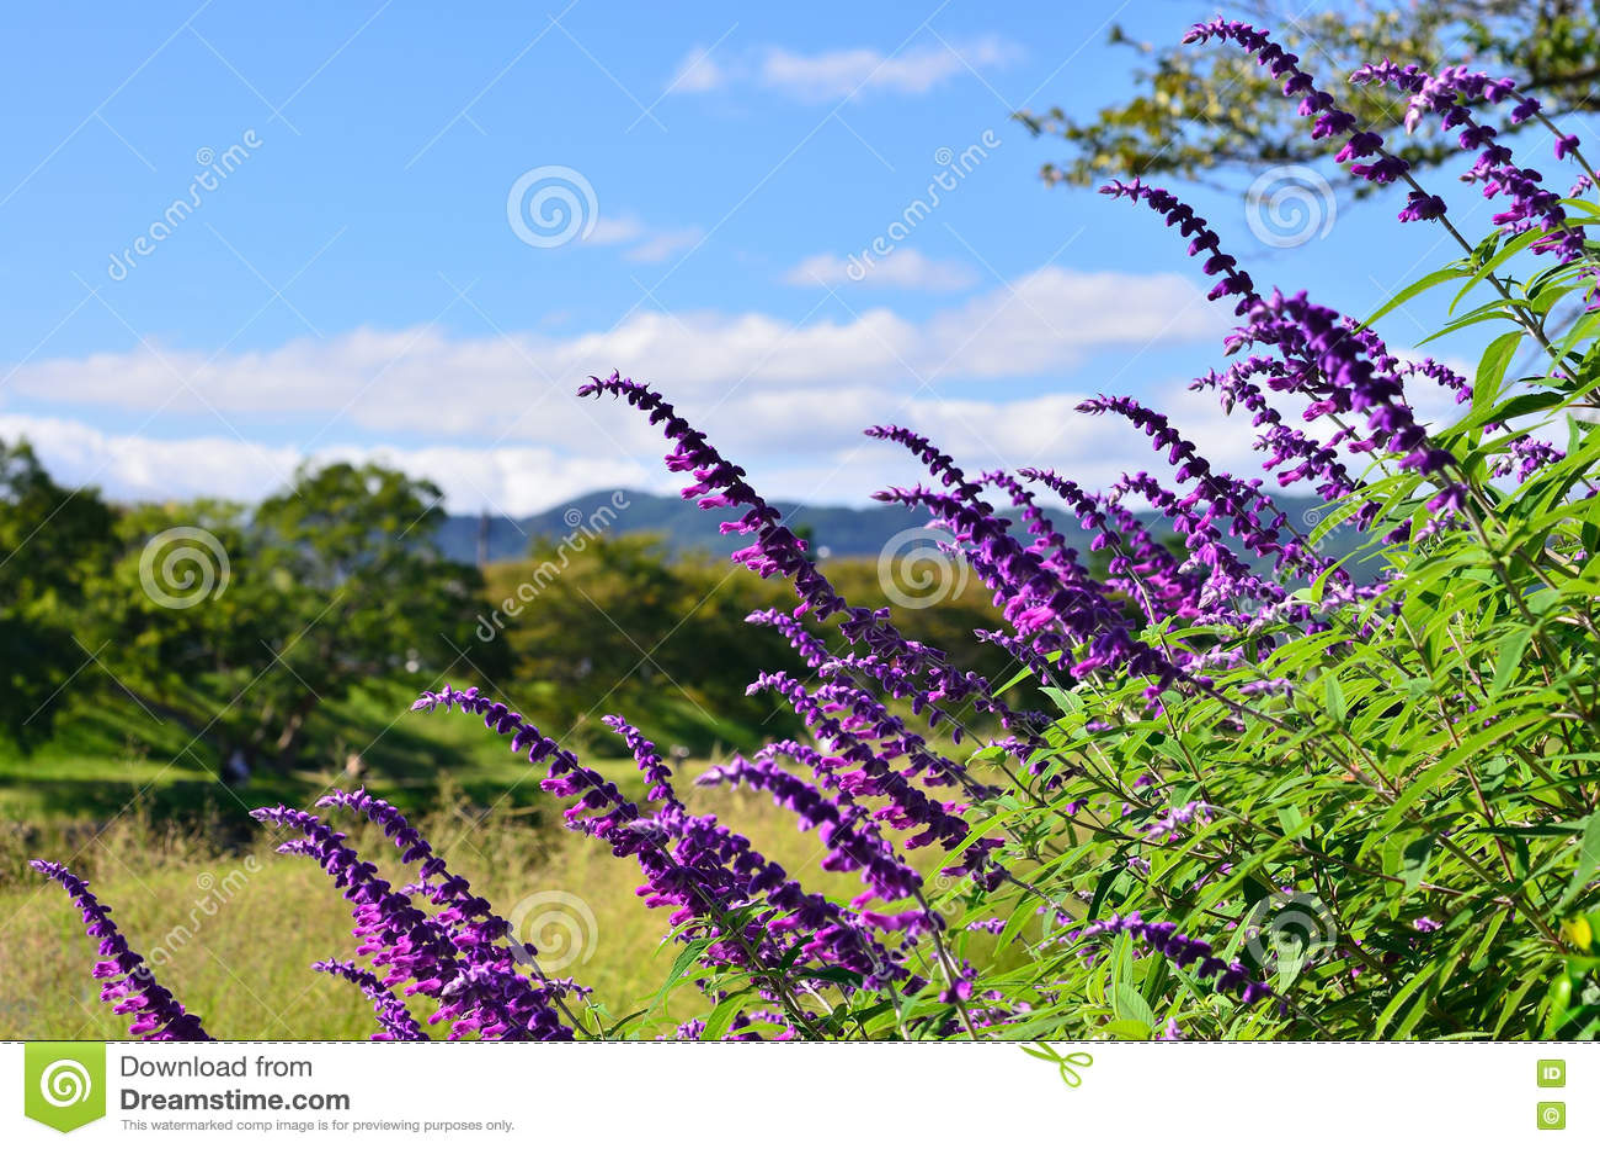 Purple sage and landscape of Kamo riverside Kyoto Japan